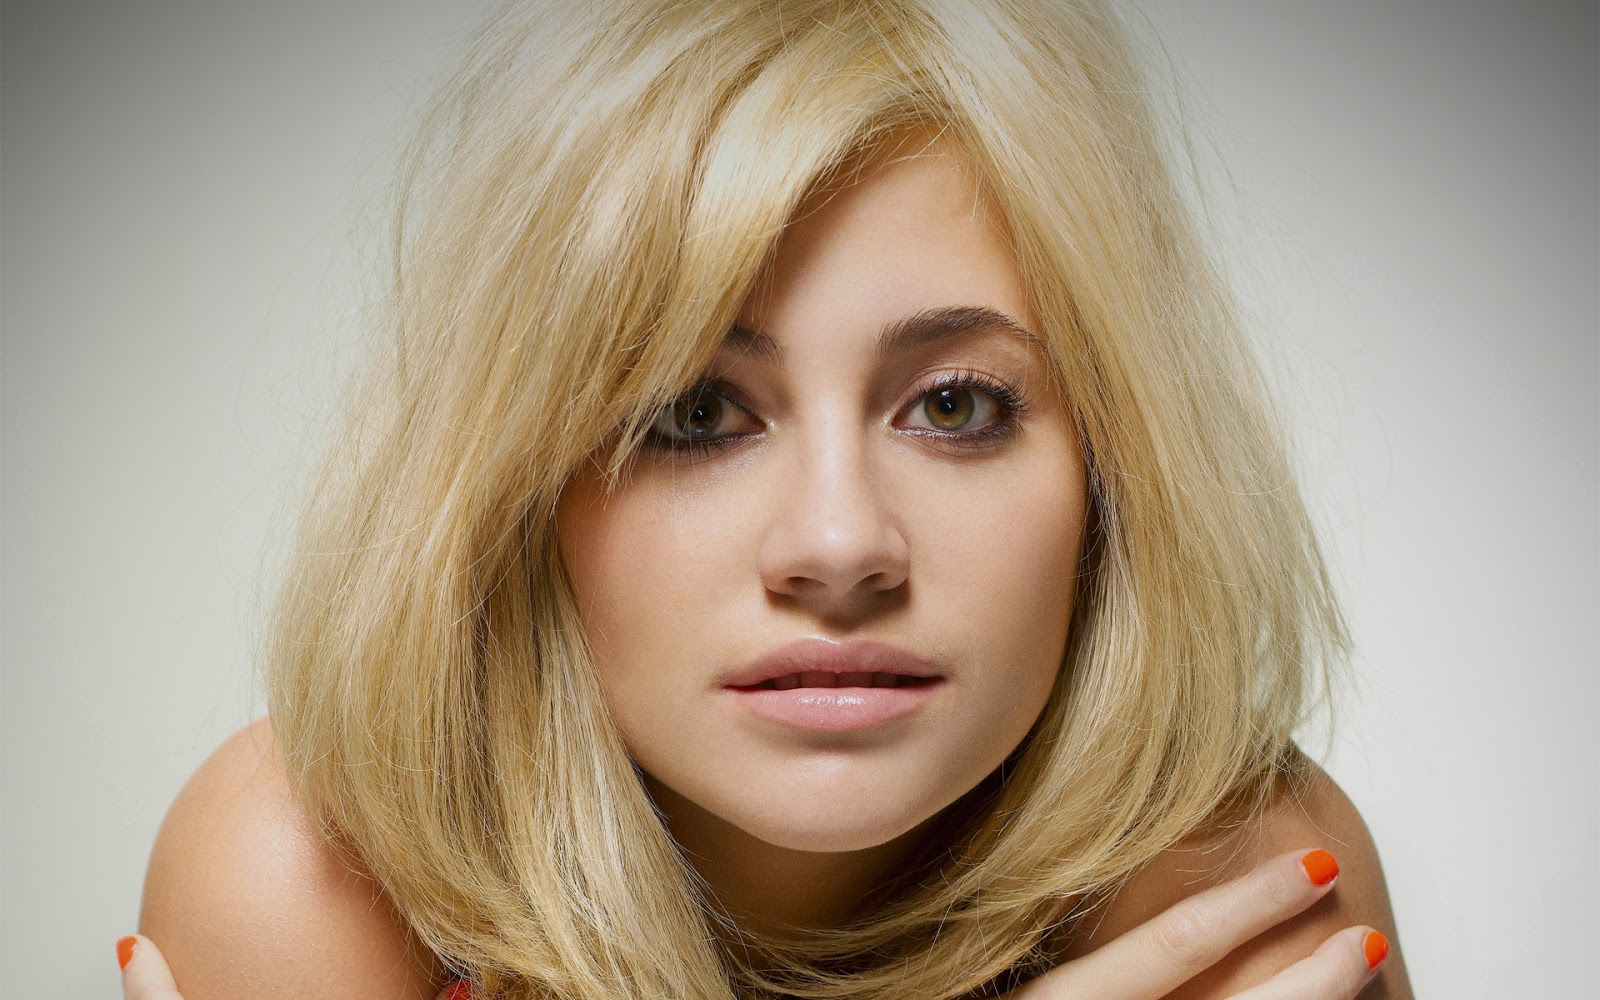 Kellie B Beautiful Steal Her Shade Nude Lips